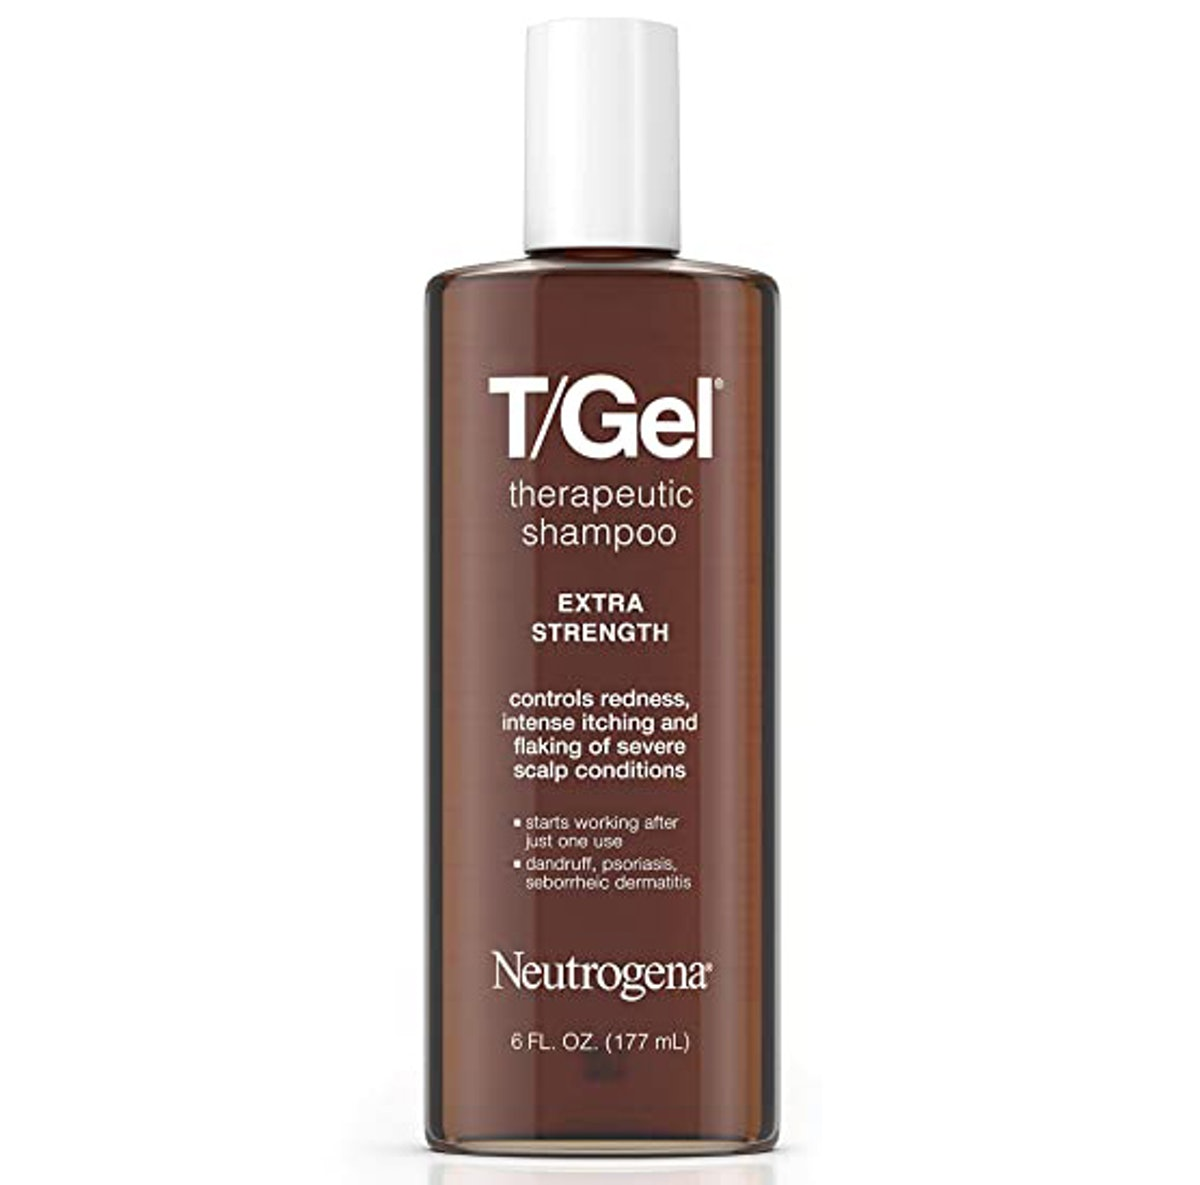 Neutrogena T/Gel Extra Strength Therapeutic Shampoo